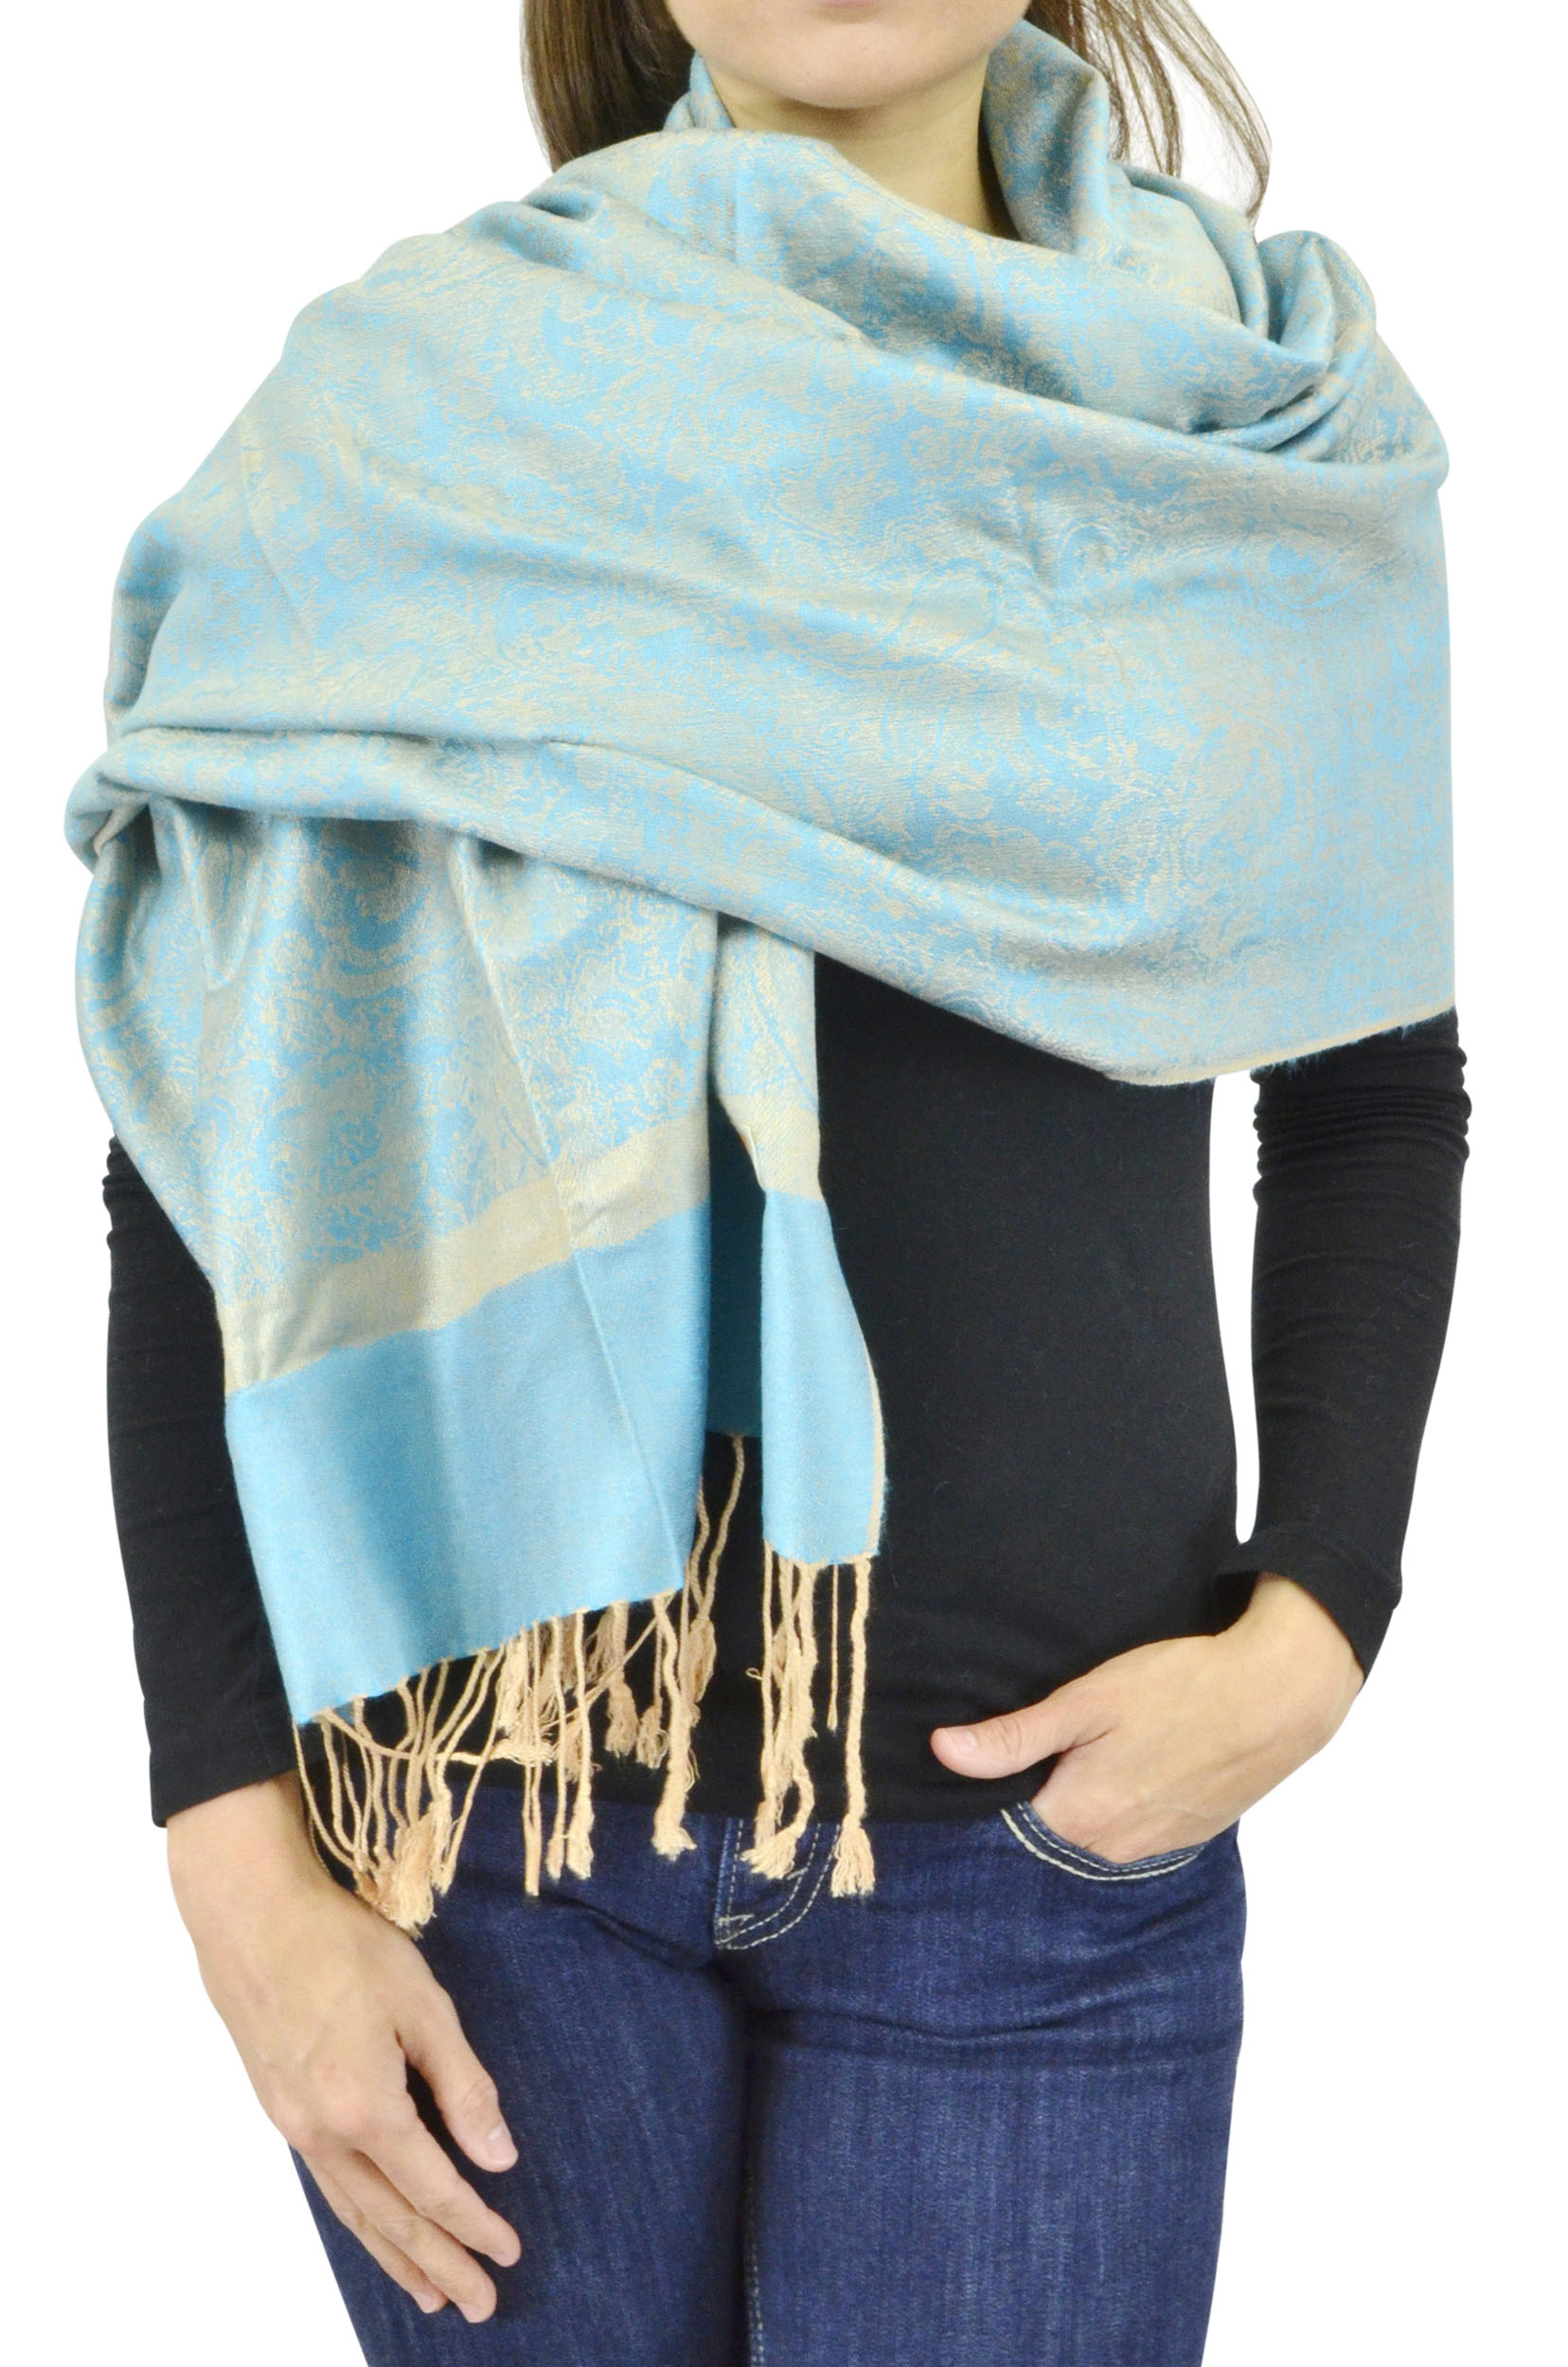 Belle Donne Women's Paisley Pashmina Shawl Wrap Scarf - Aqua